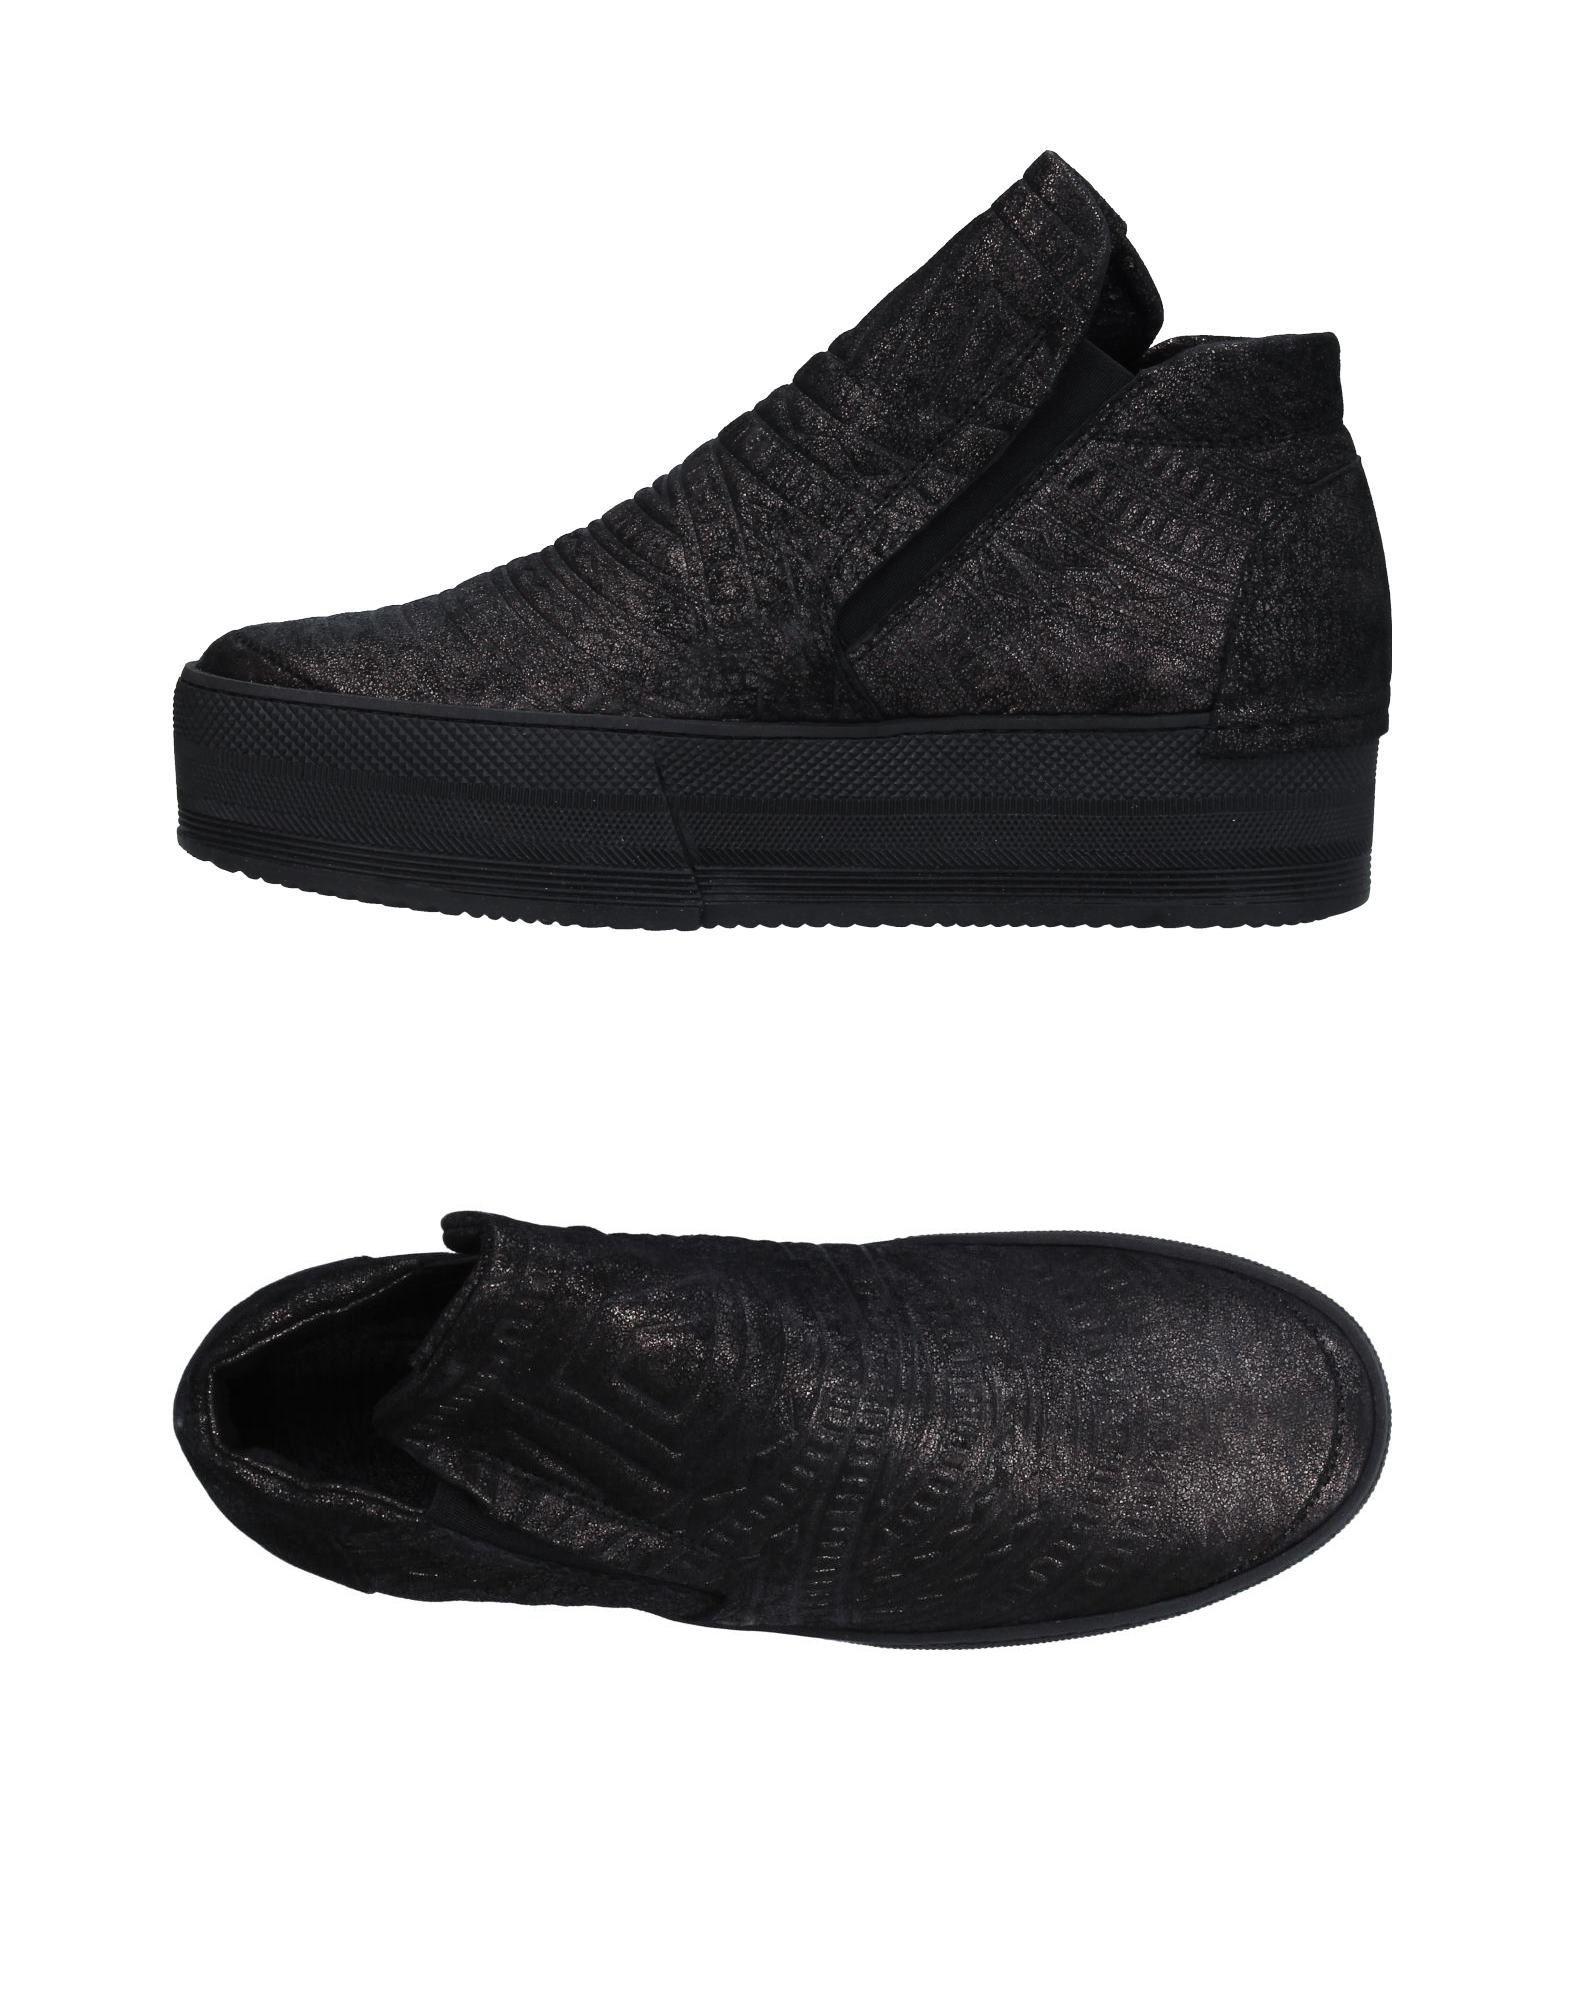 CA by CINZIA ARAIA Высокие кеды и кроссовки am pm by bottega backdoor высокие кеды и кроссовки